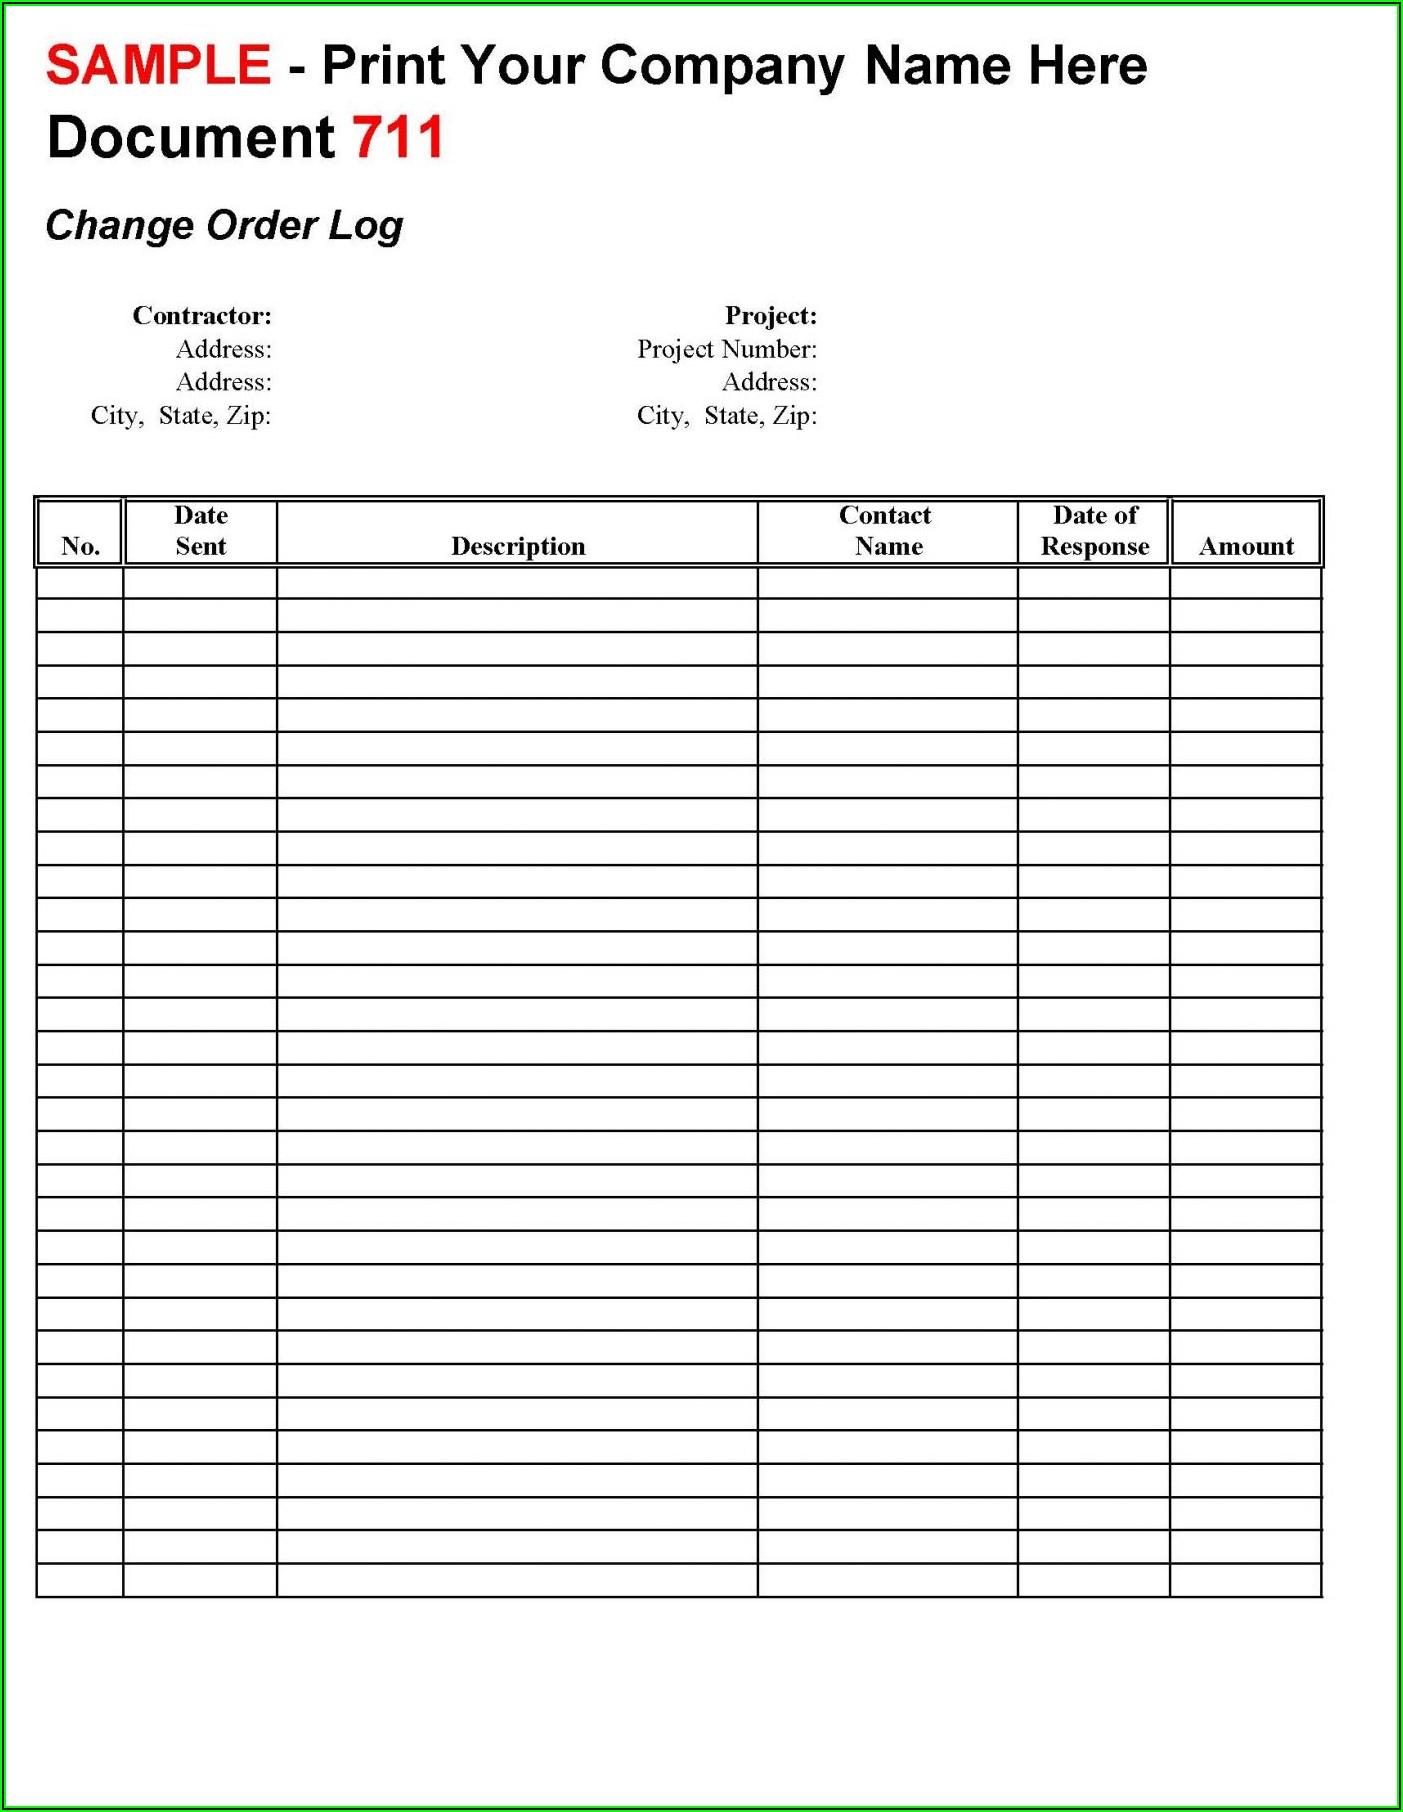 Construction Change Order Log Template Excel